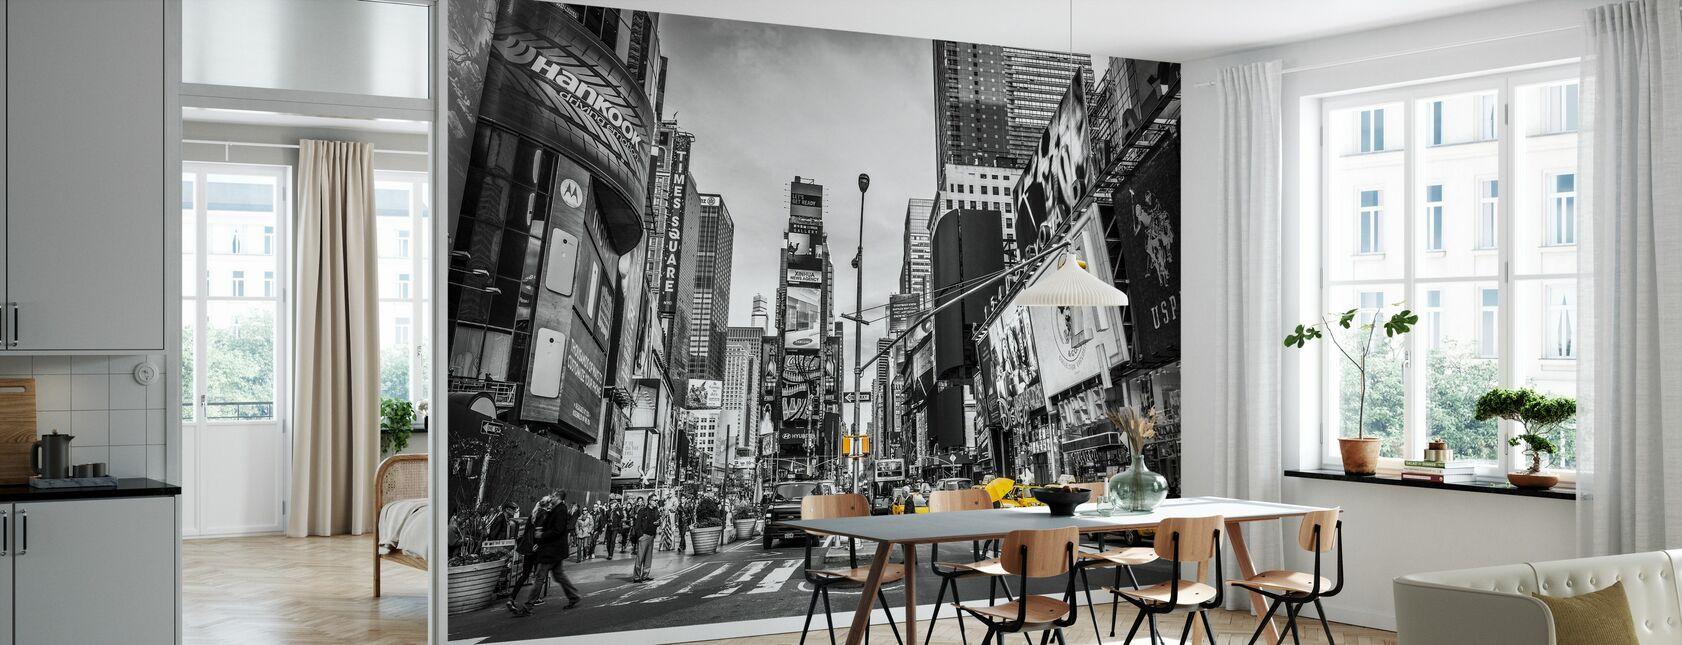 New York City Cabs - Carta da parati - Cucina